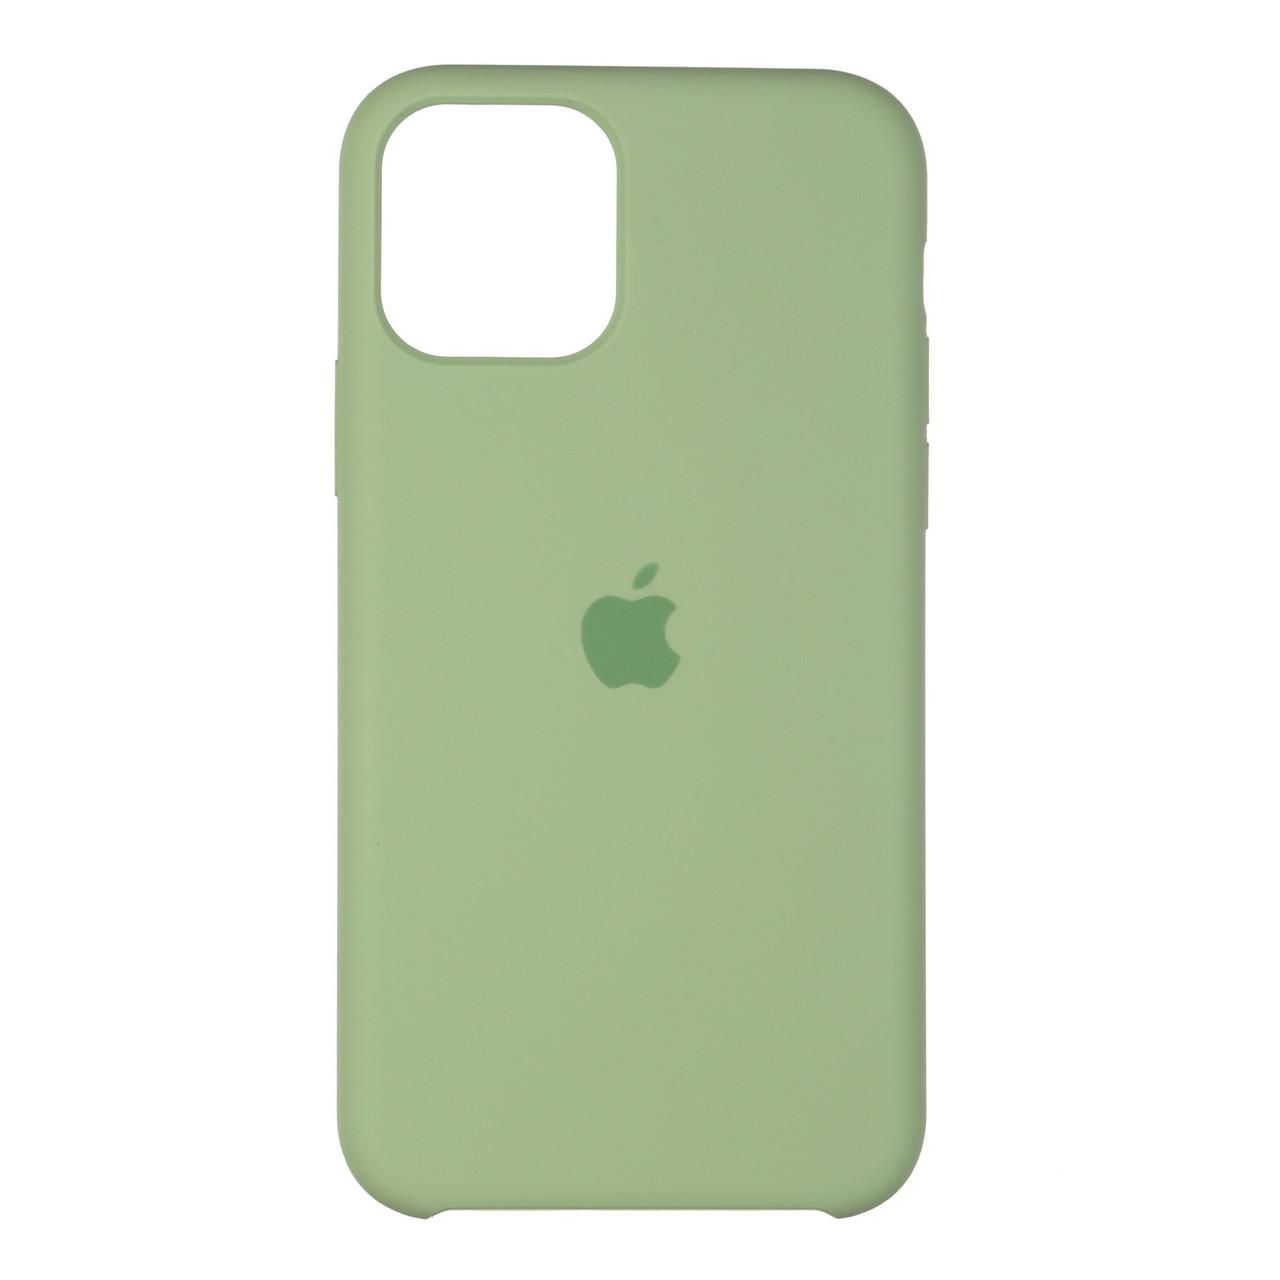 Armor Standart Silicone Case чехол для iPhone 11 Pro - Mint